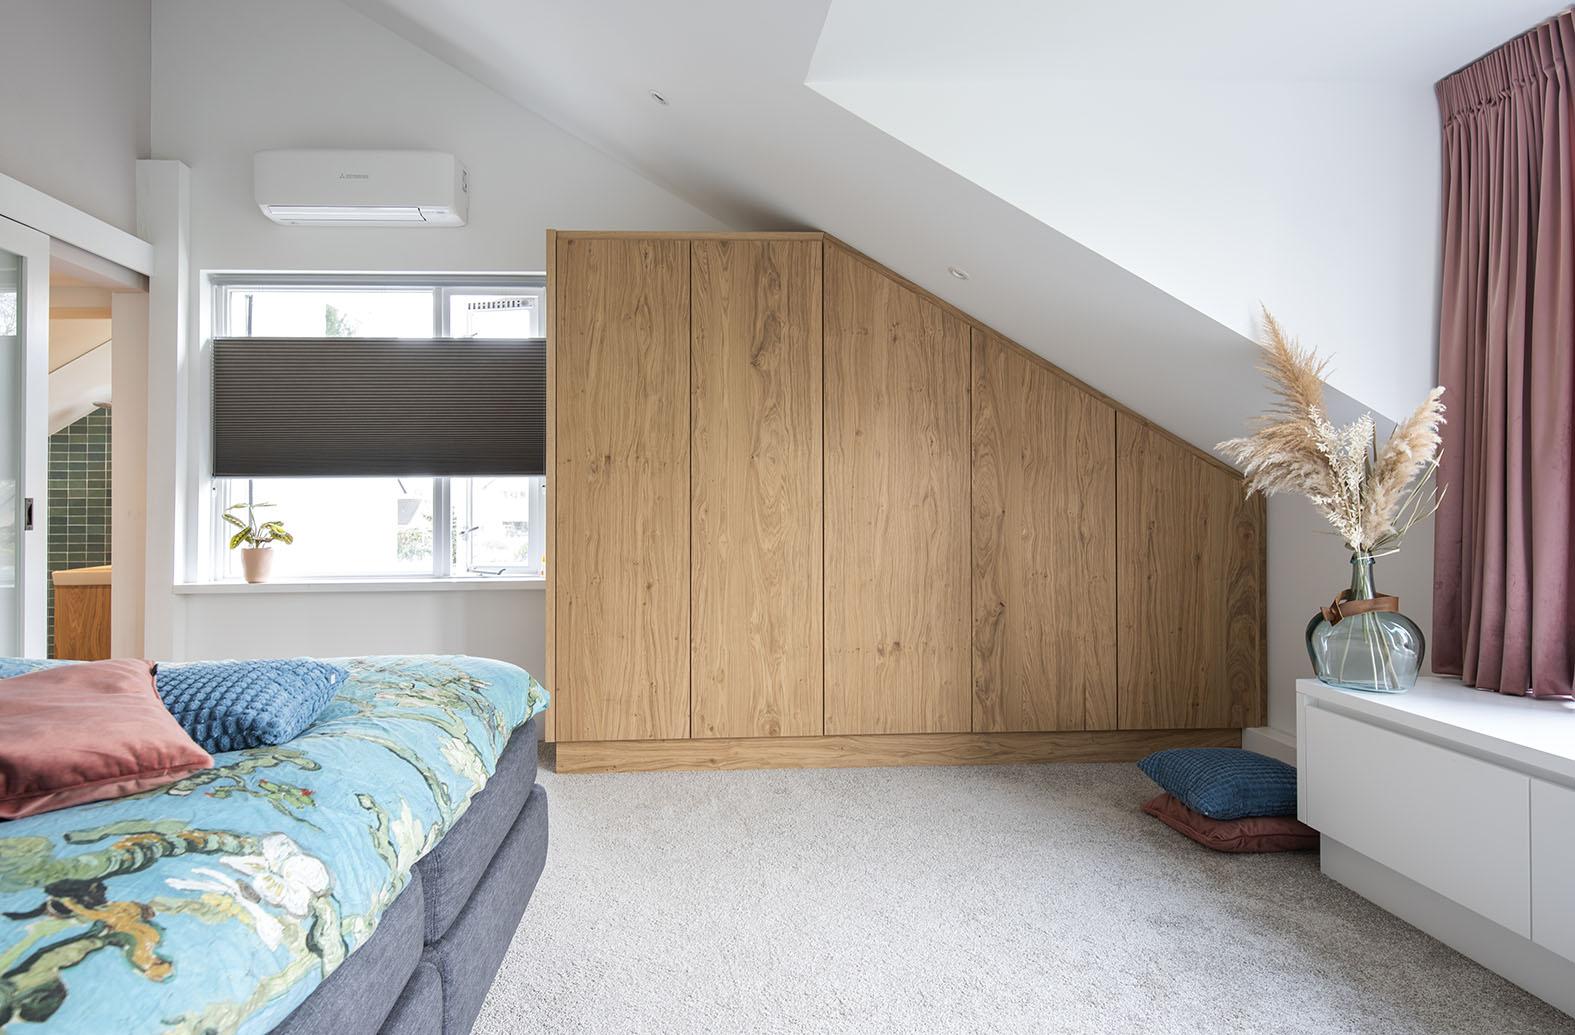 slaapkamer maatkasten laten maken interieuradvies Den Bosch styling